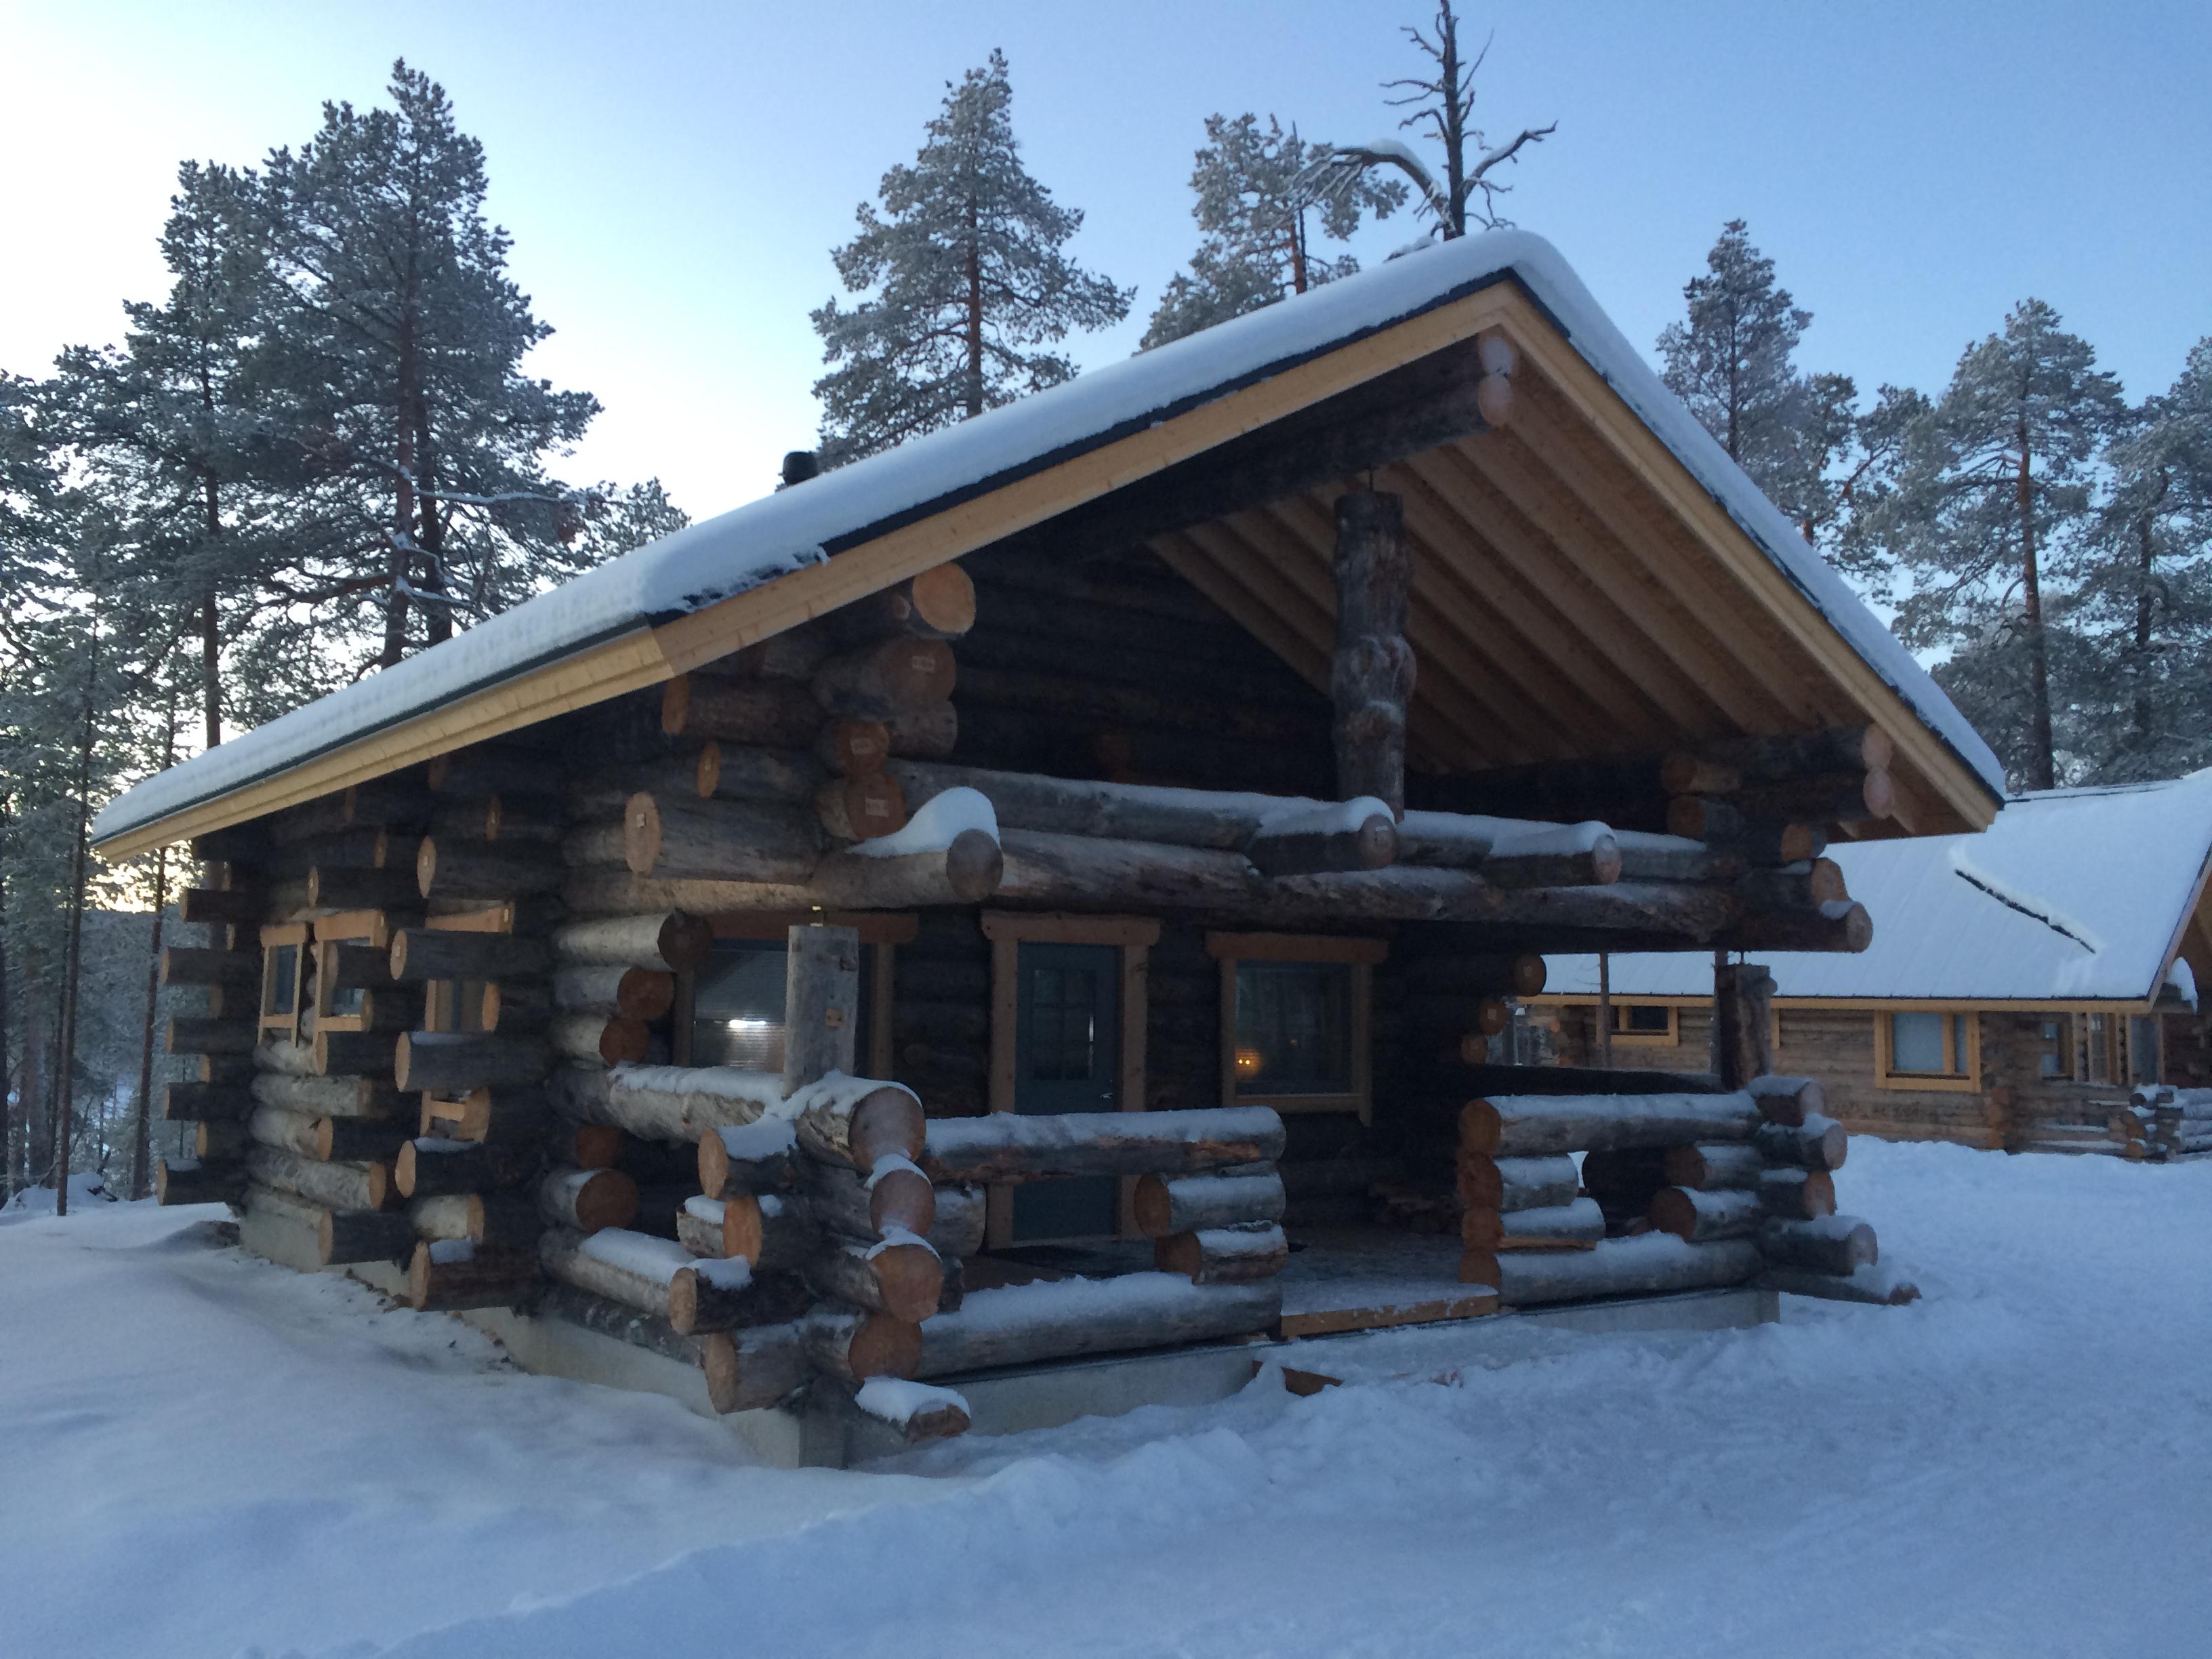 Nellim Wilderness Lodge - Cabins